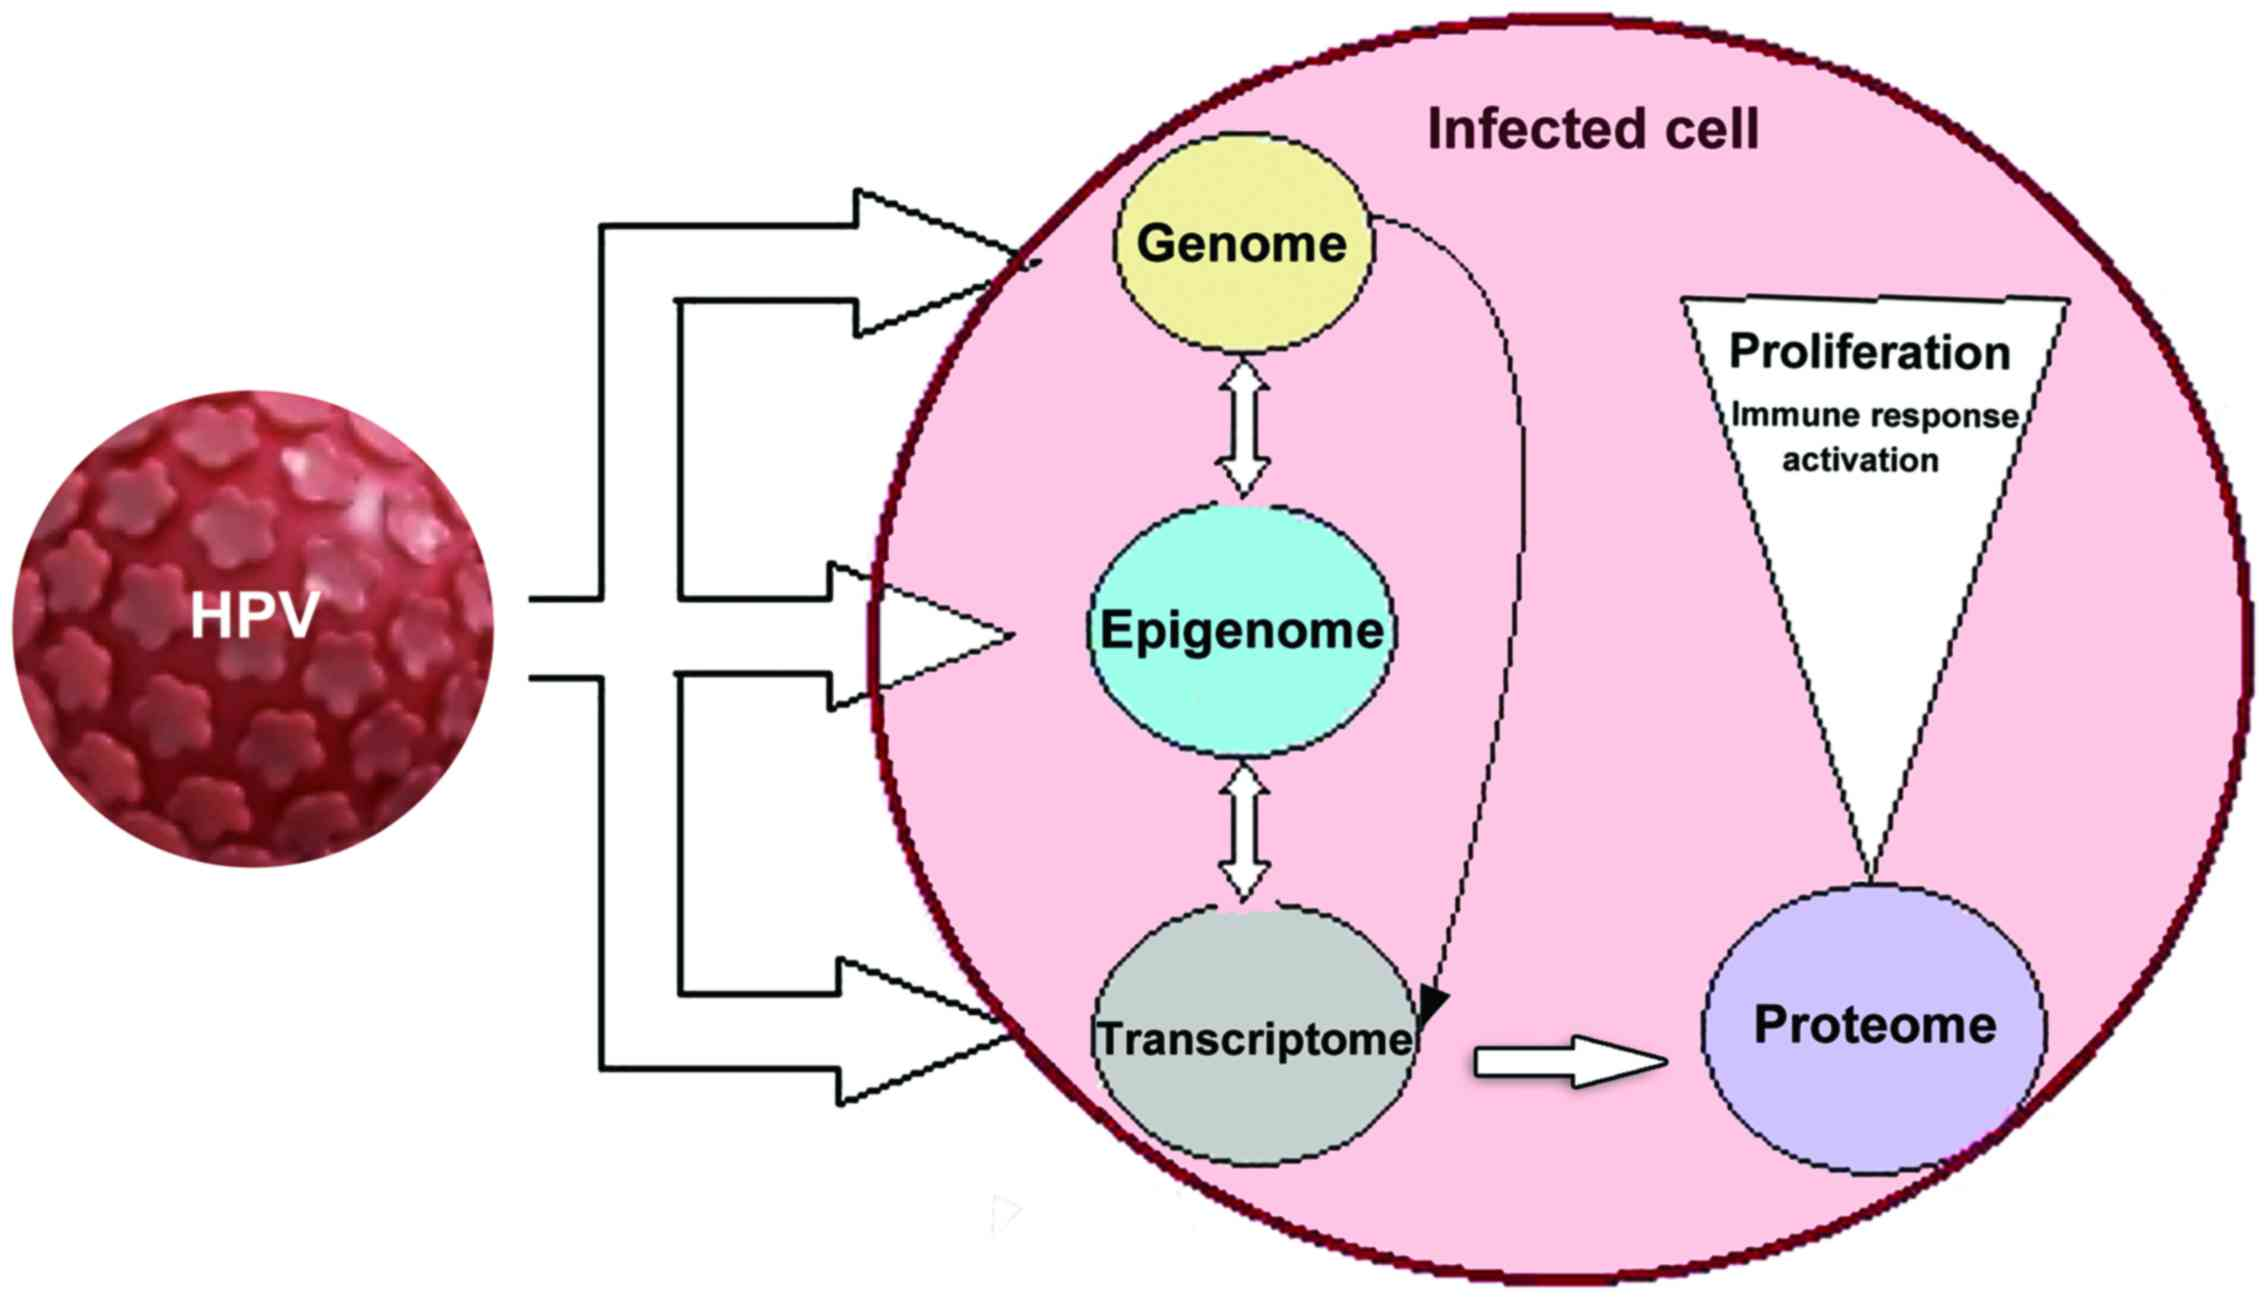 human papillomavirus genome integration and head and neck cancer